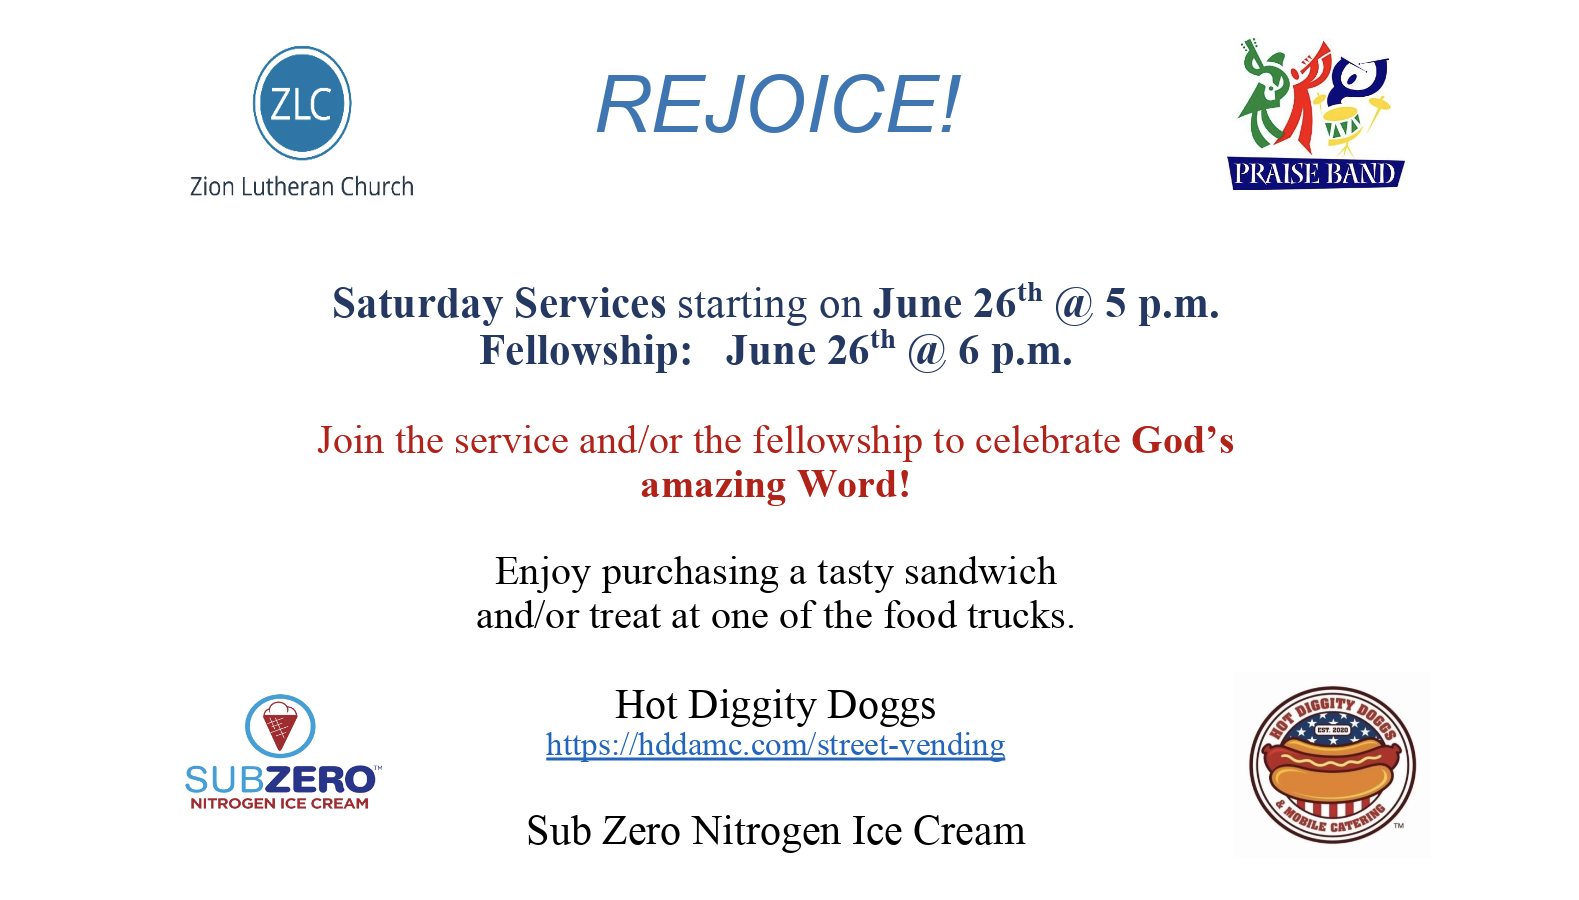 June 26: Saturday Service & Fellowship